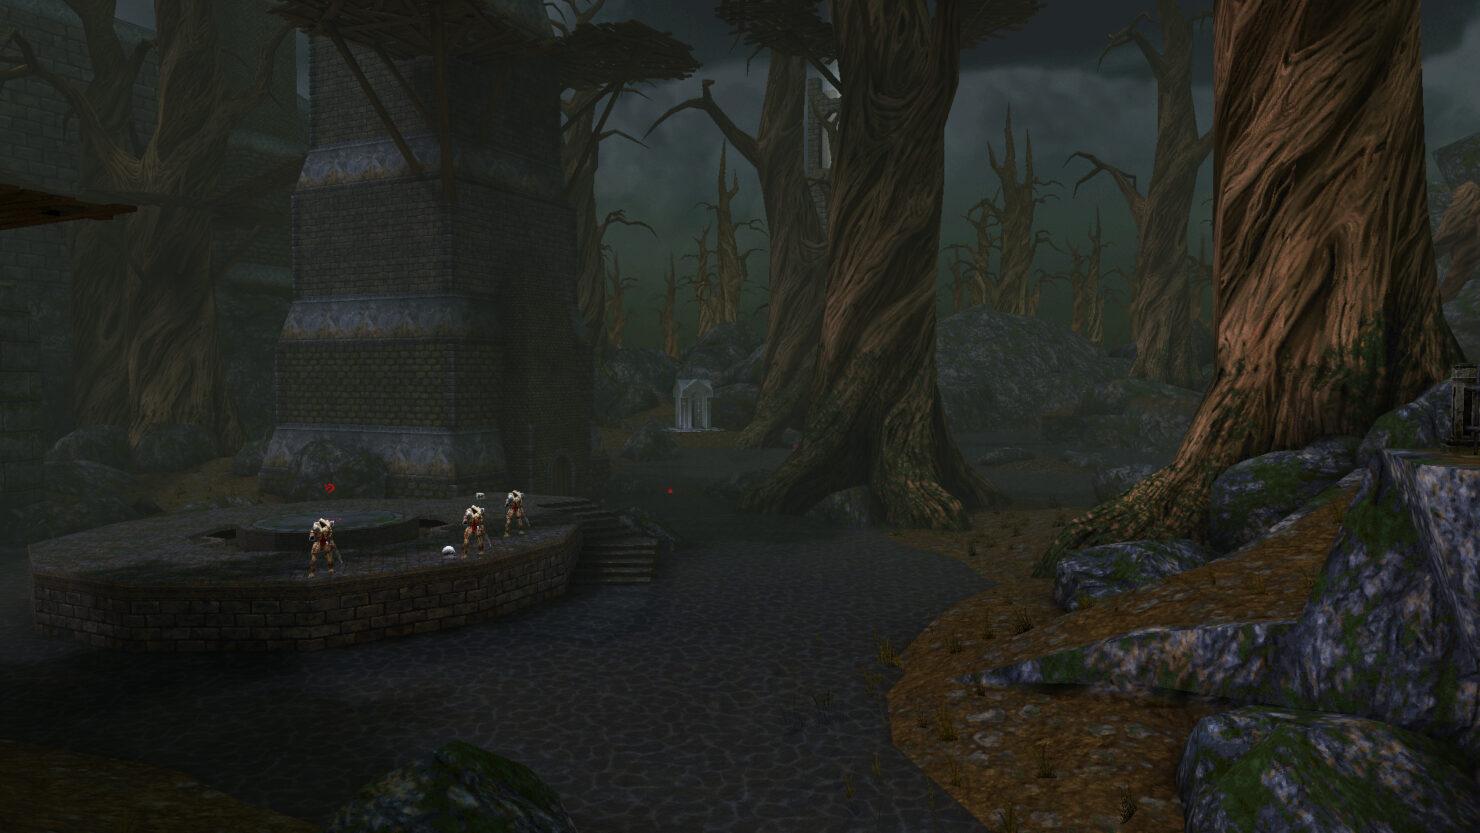 wrath-aeon-of-fury-early-access-launch-02-screenshot-8